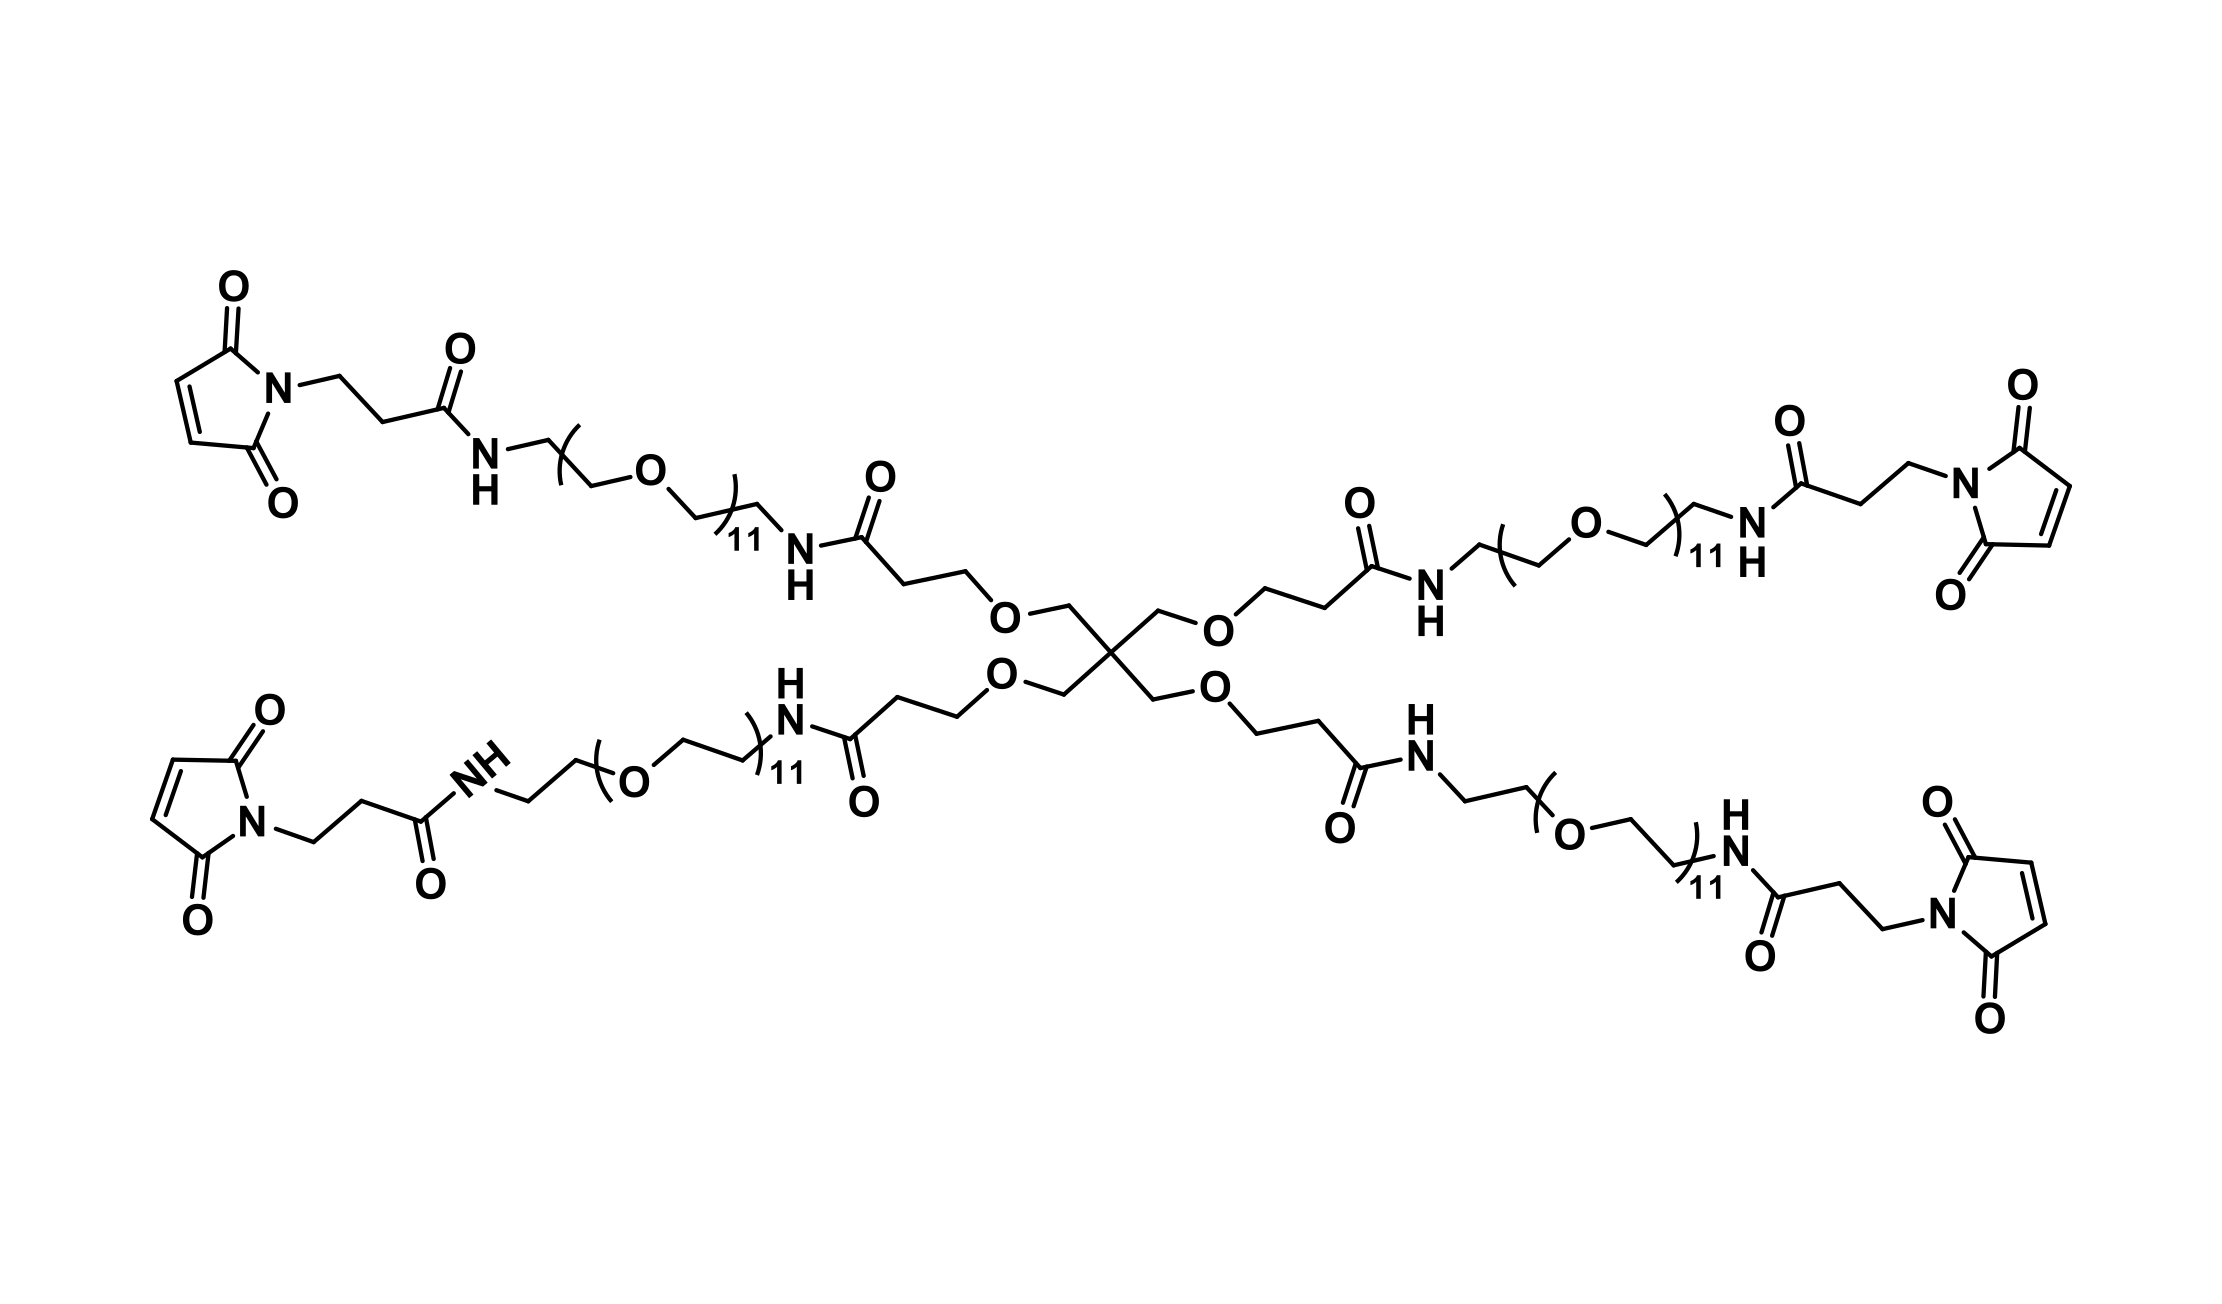 Tetra(-amido-dPEG®₁₁-MAL)pentaerythritol